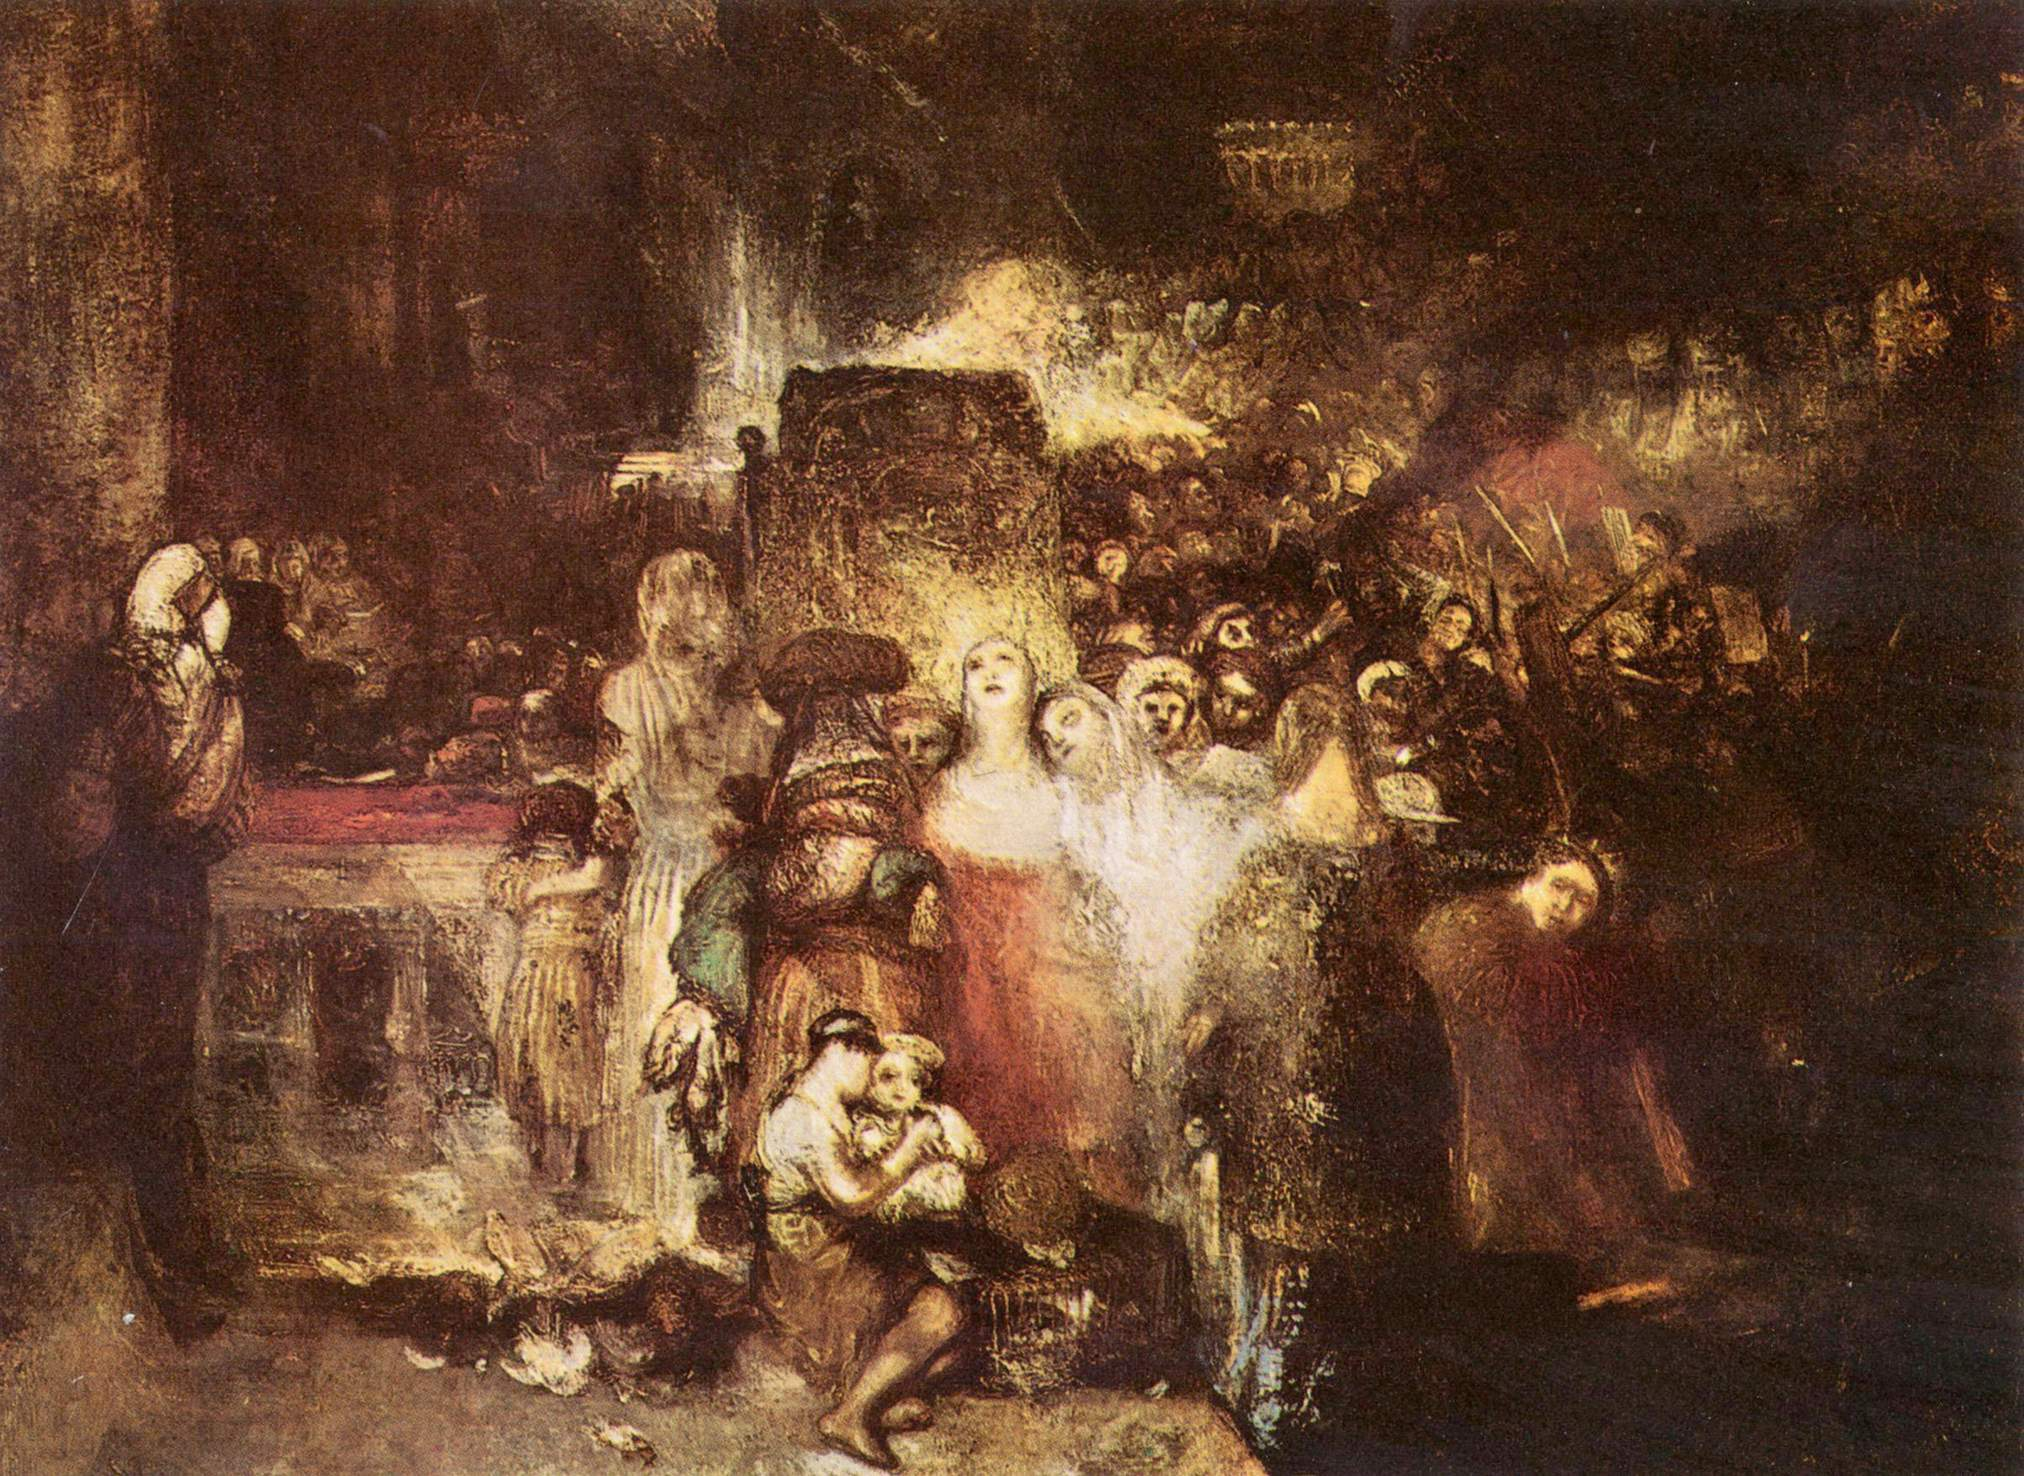 картина Пилат, умывающий руки :: Уильям Тёрнер - William Turner фото